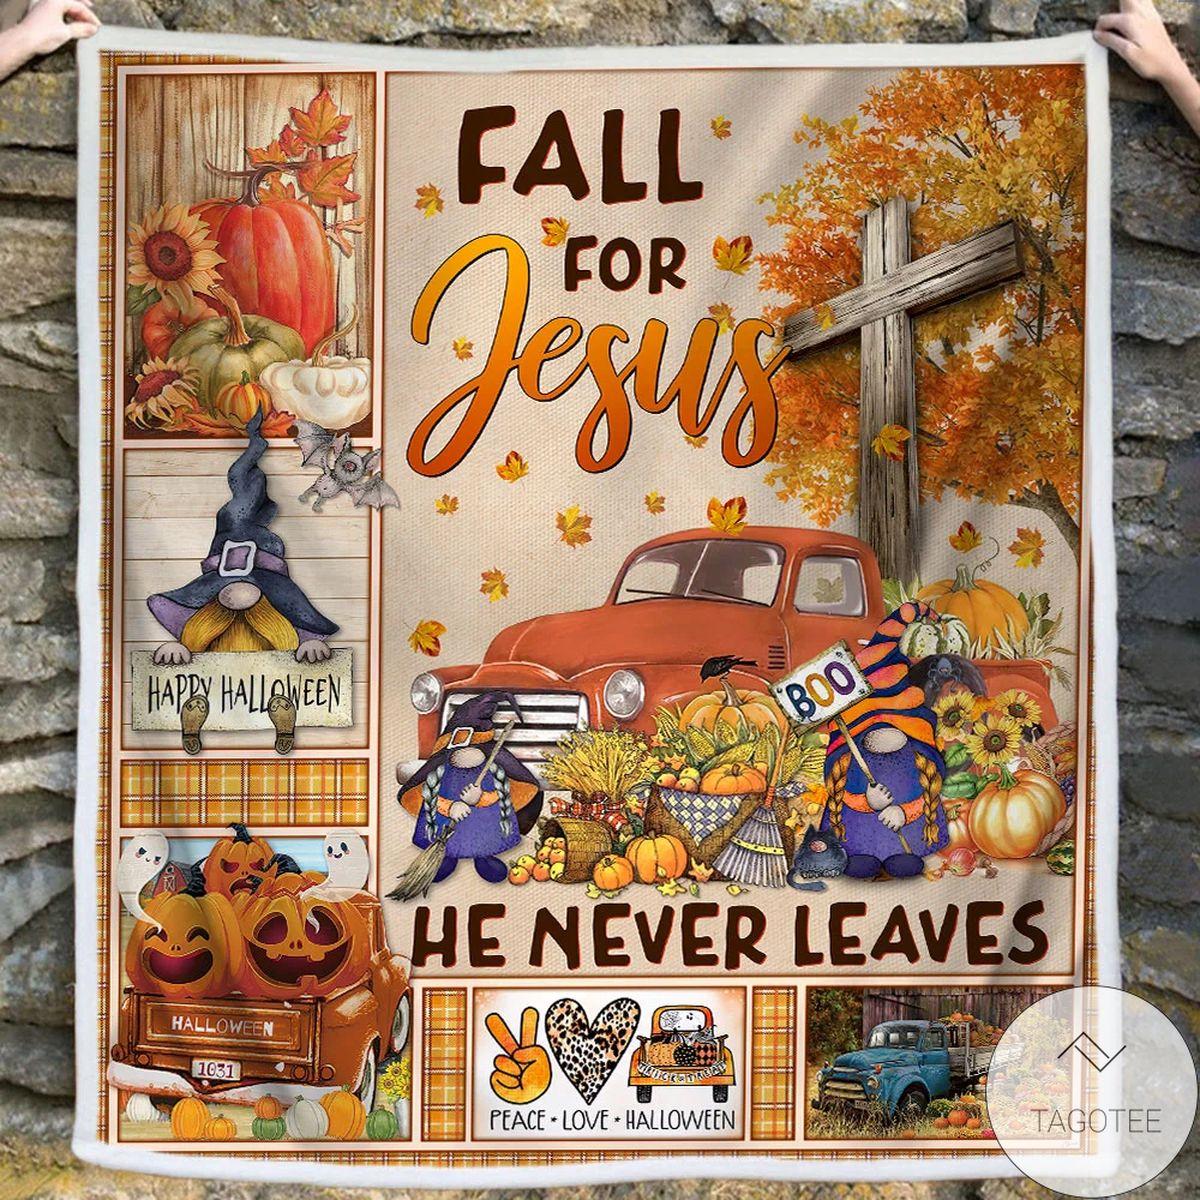 Nice Fall For Jesus He Never Leave Halloween Truck Sofa Throw Blanket